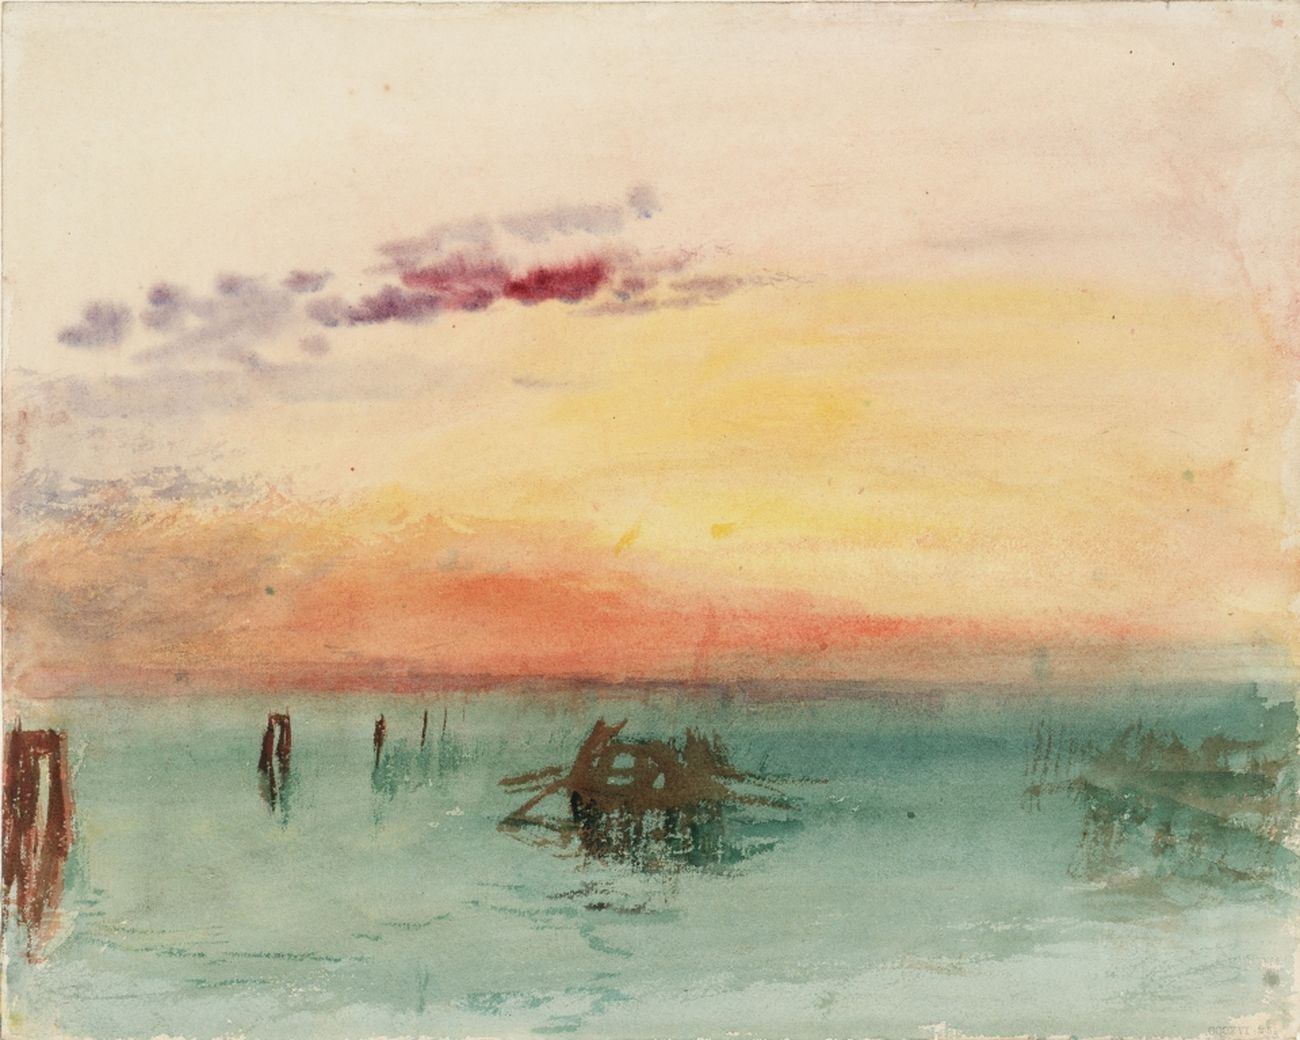 Joseph Mallord William Turner, Venice. Looking across the Lagoon at Sunset, 1840. Tate